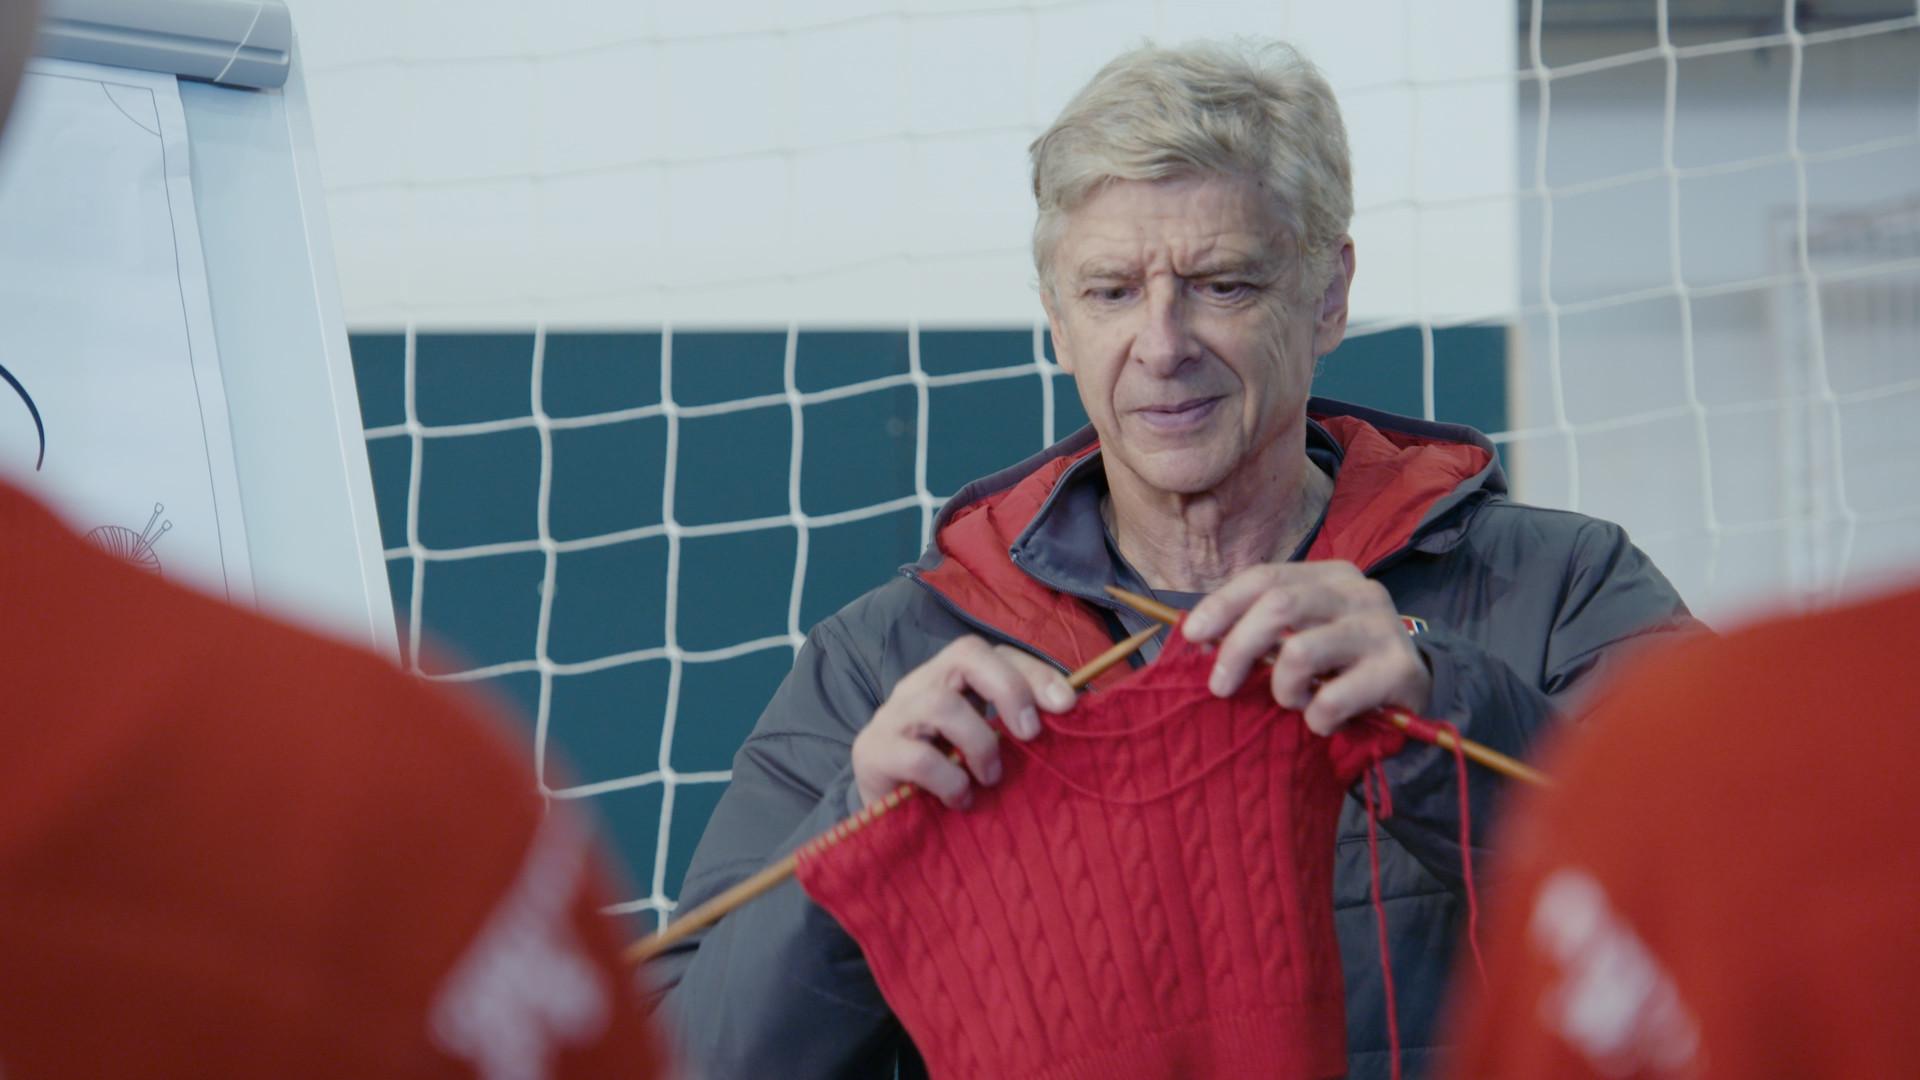 Arsenal_5_1.6.1.jpg